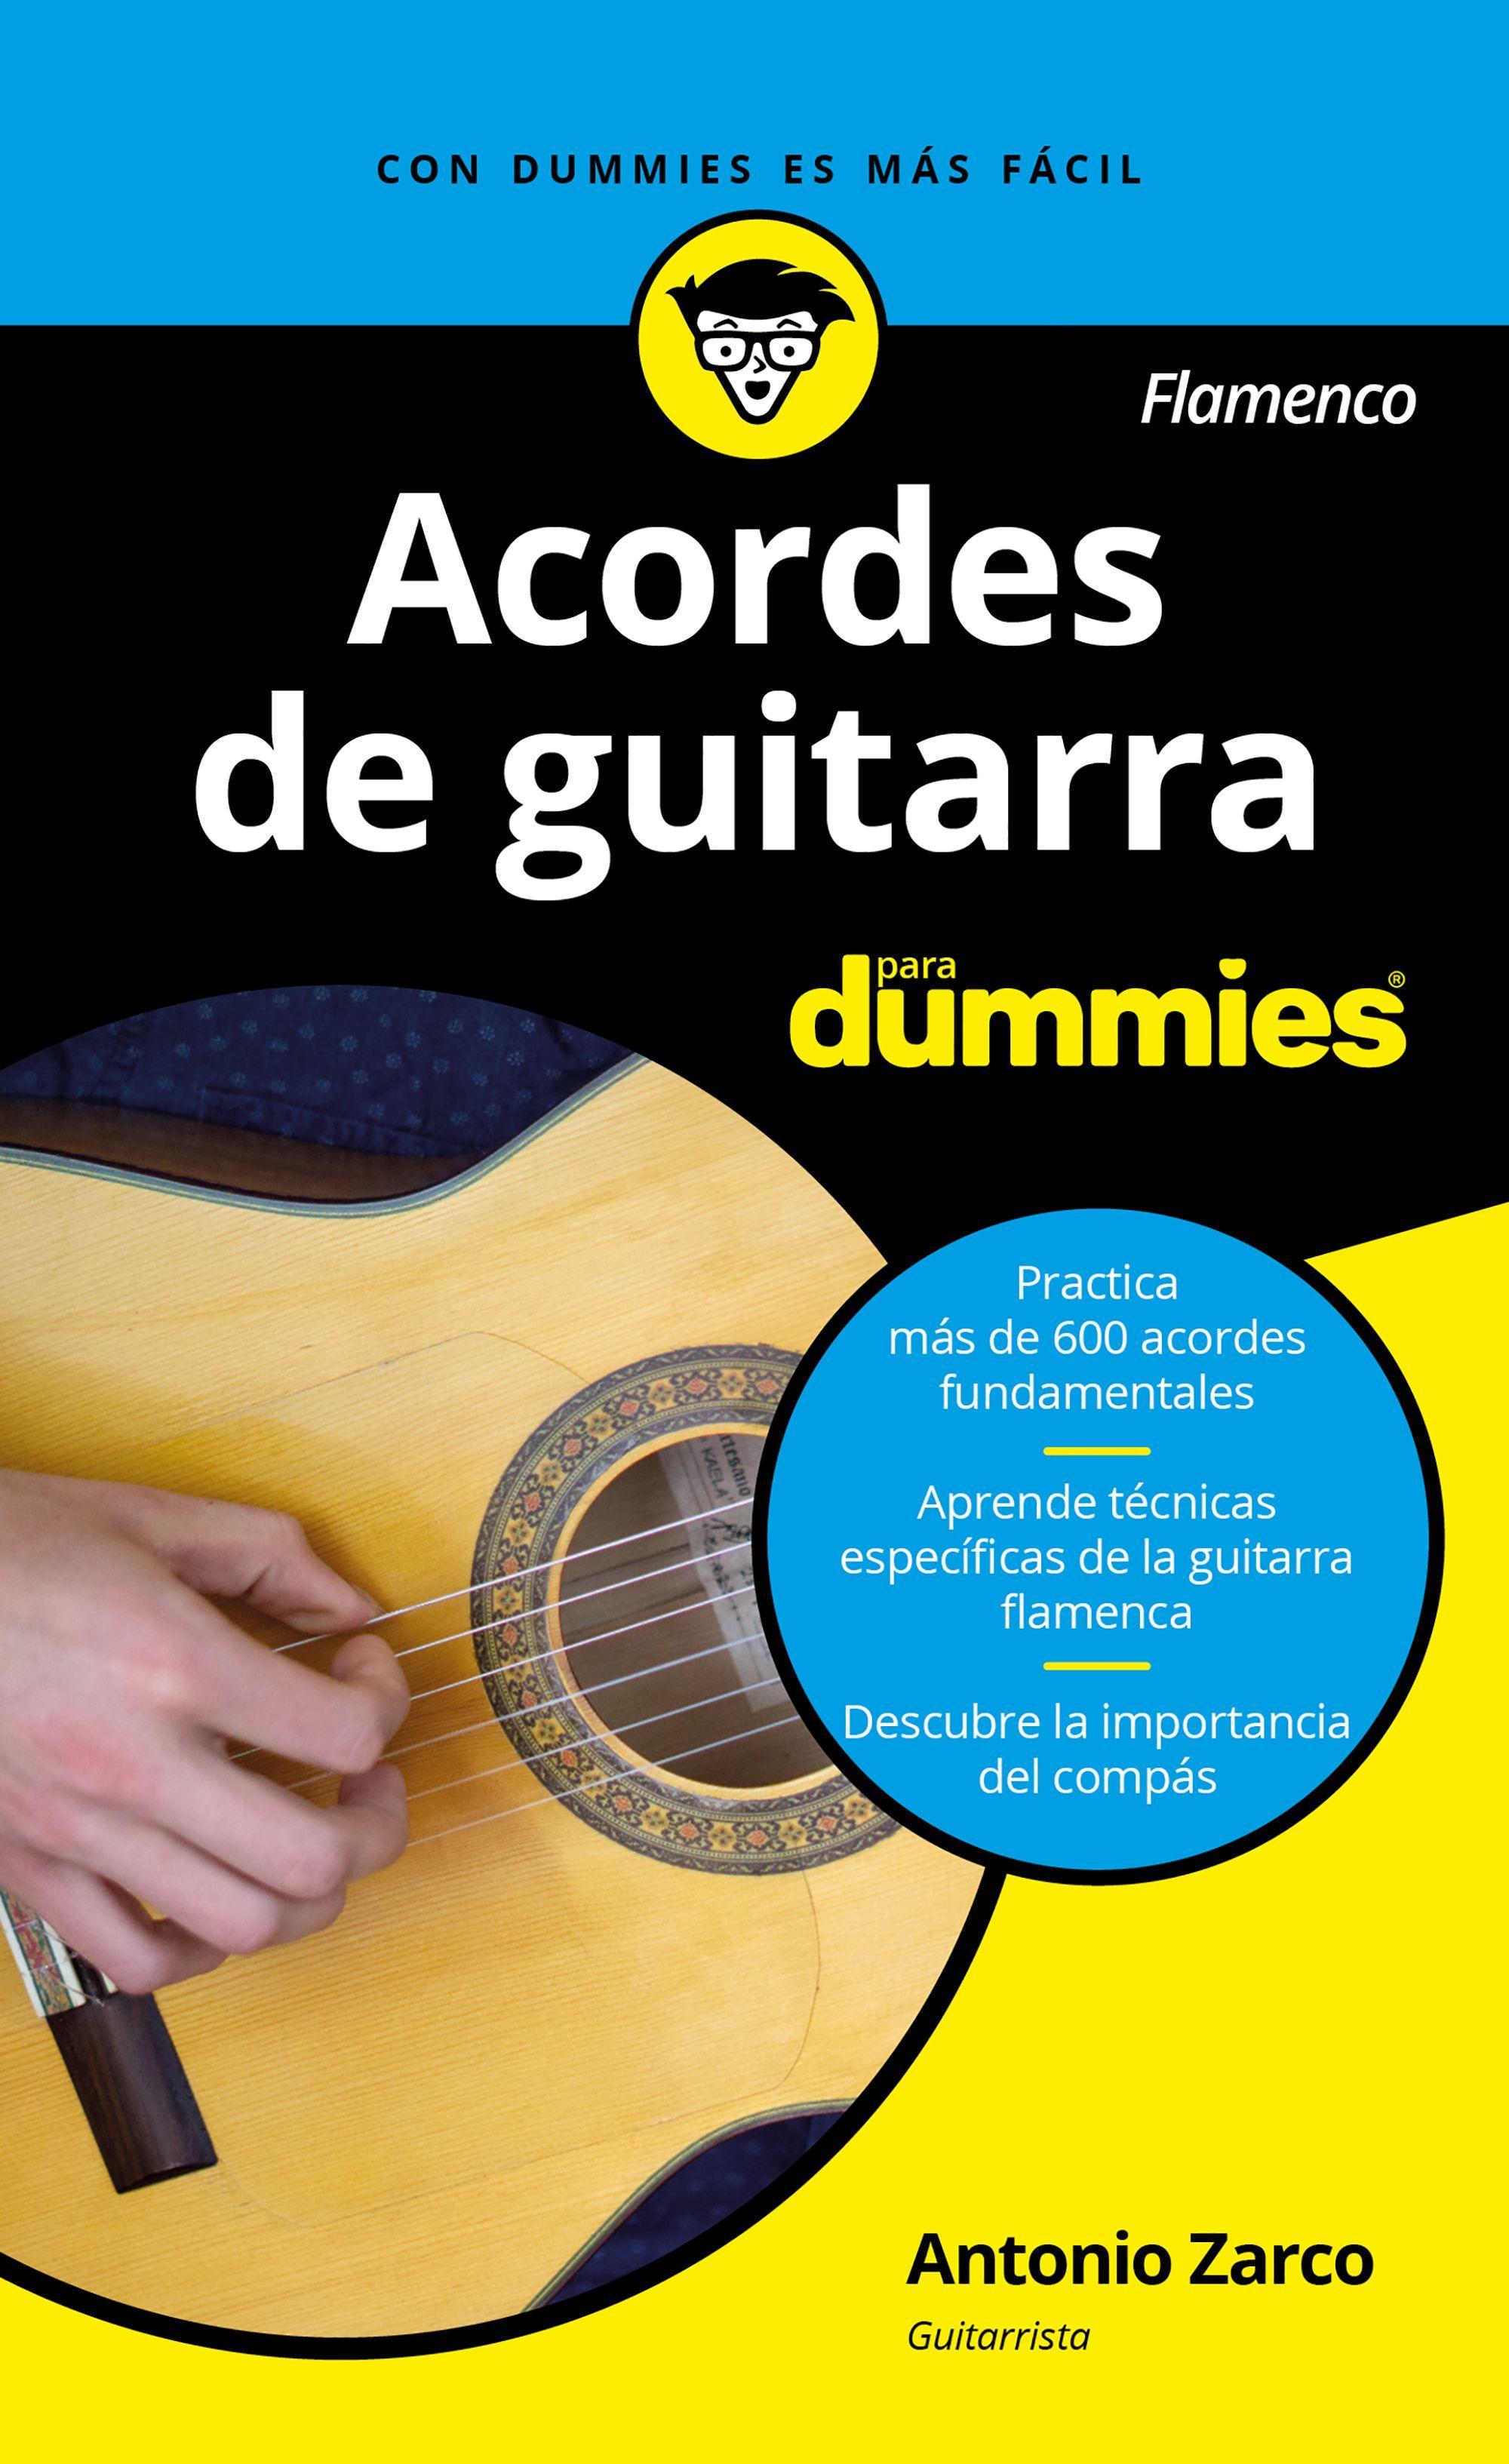 ACORDES DE GUITARRA (FLAMENCO) PARA DUMMIES